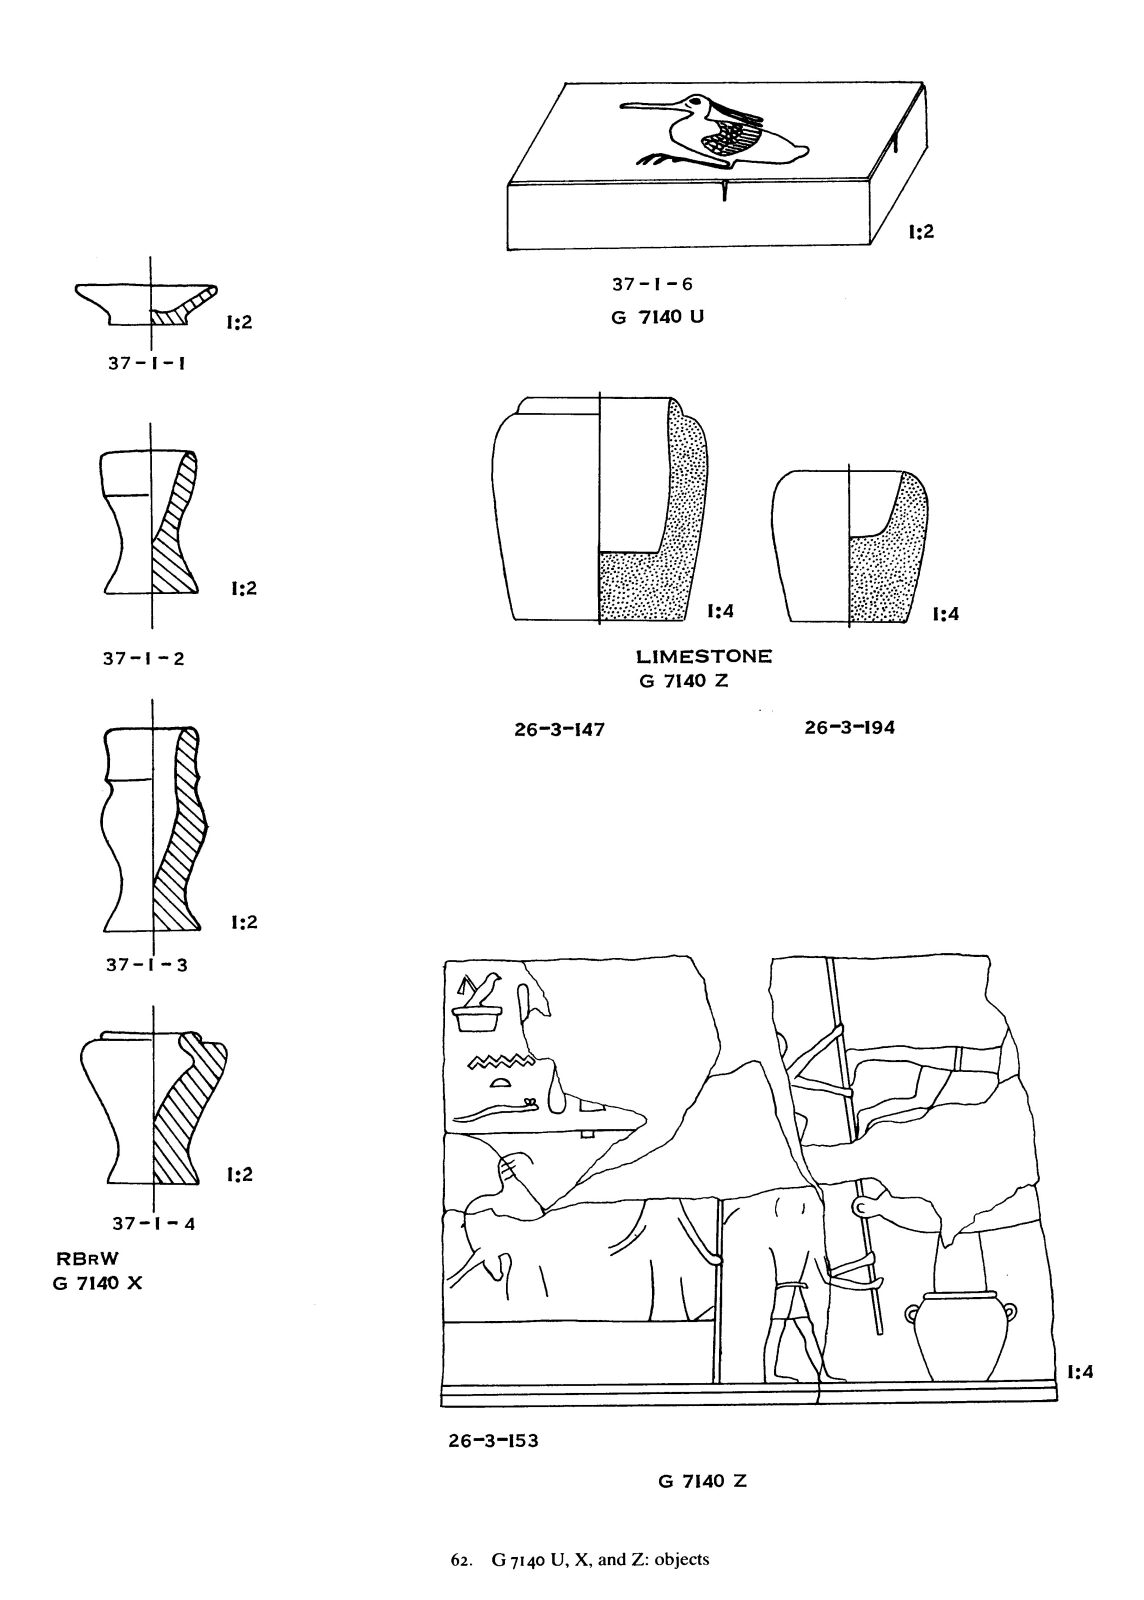 Drawings: G 7140: objects from Shaft U, X, Z